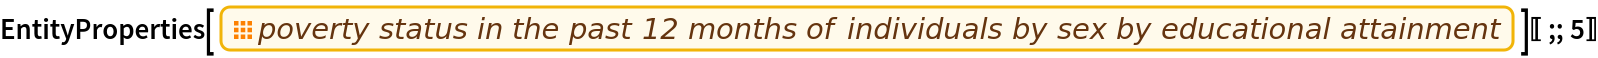 "EntityProperties[EntityPropertyClass[""CensusTract"", ""B17003""]][[;; 5]]"